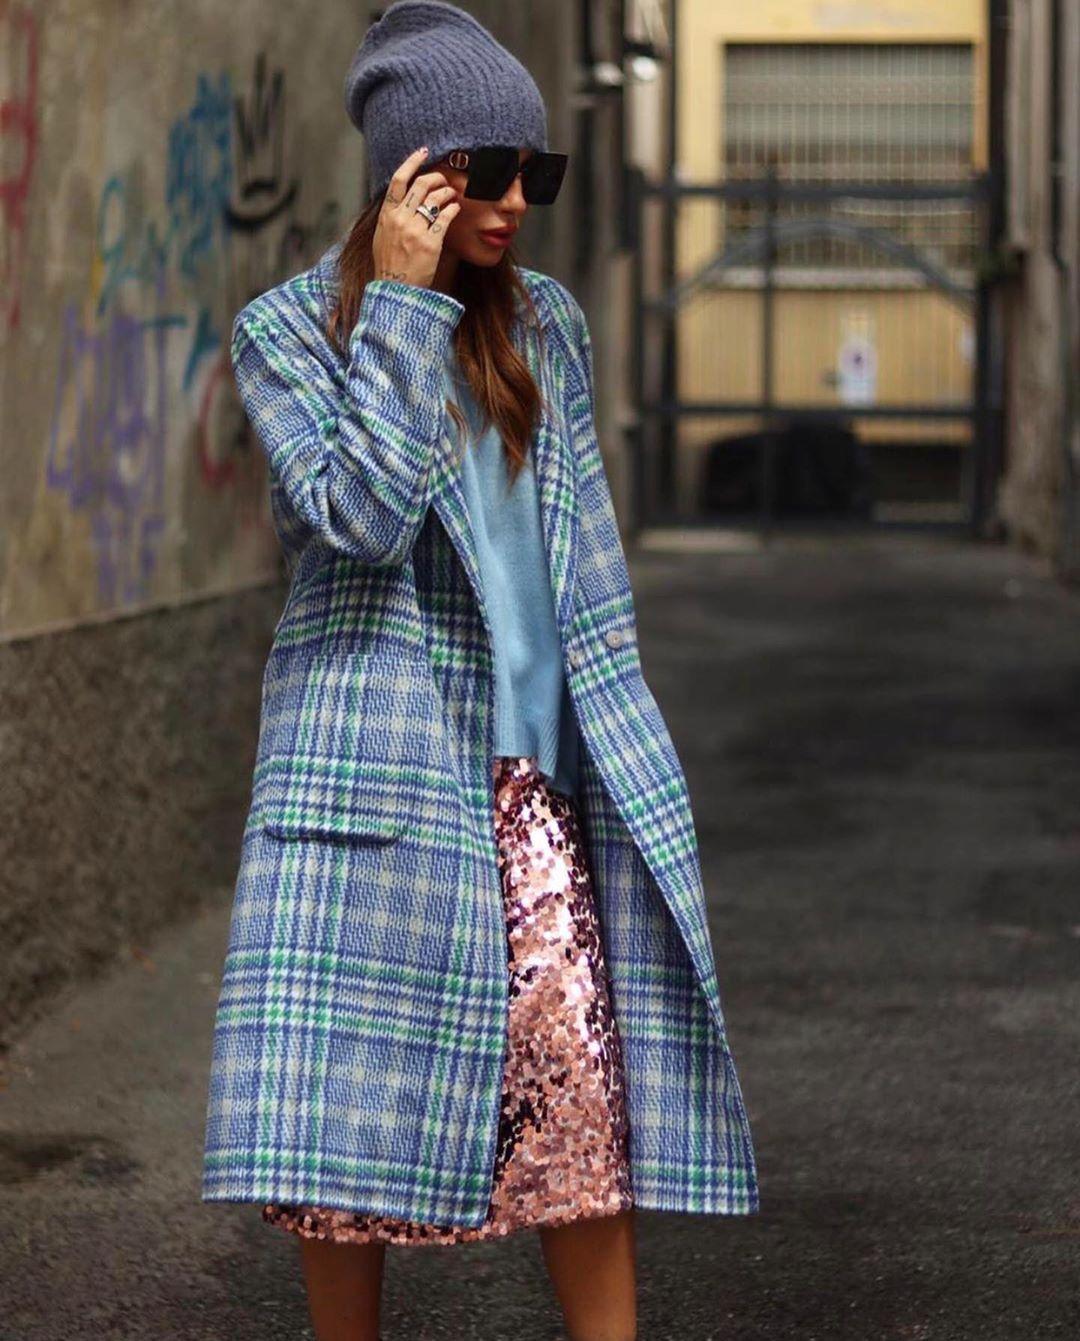 "QDRESSCODE®️ on Instagram: ""Blue sky 💙 Via @audreybrescia #love #style #streetstyle #girl #model #picoftheday #fashion #instalike #blogger #fashionista #instadaily…"""